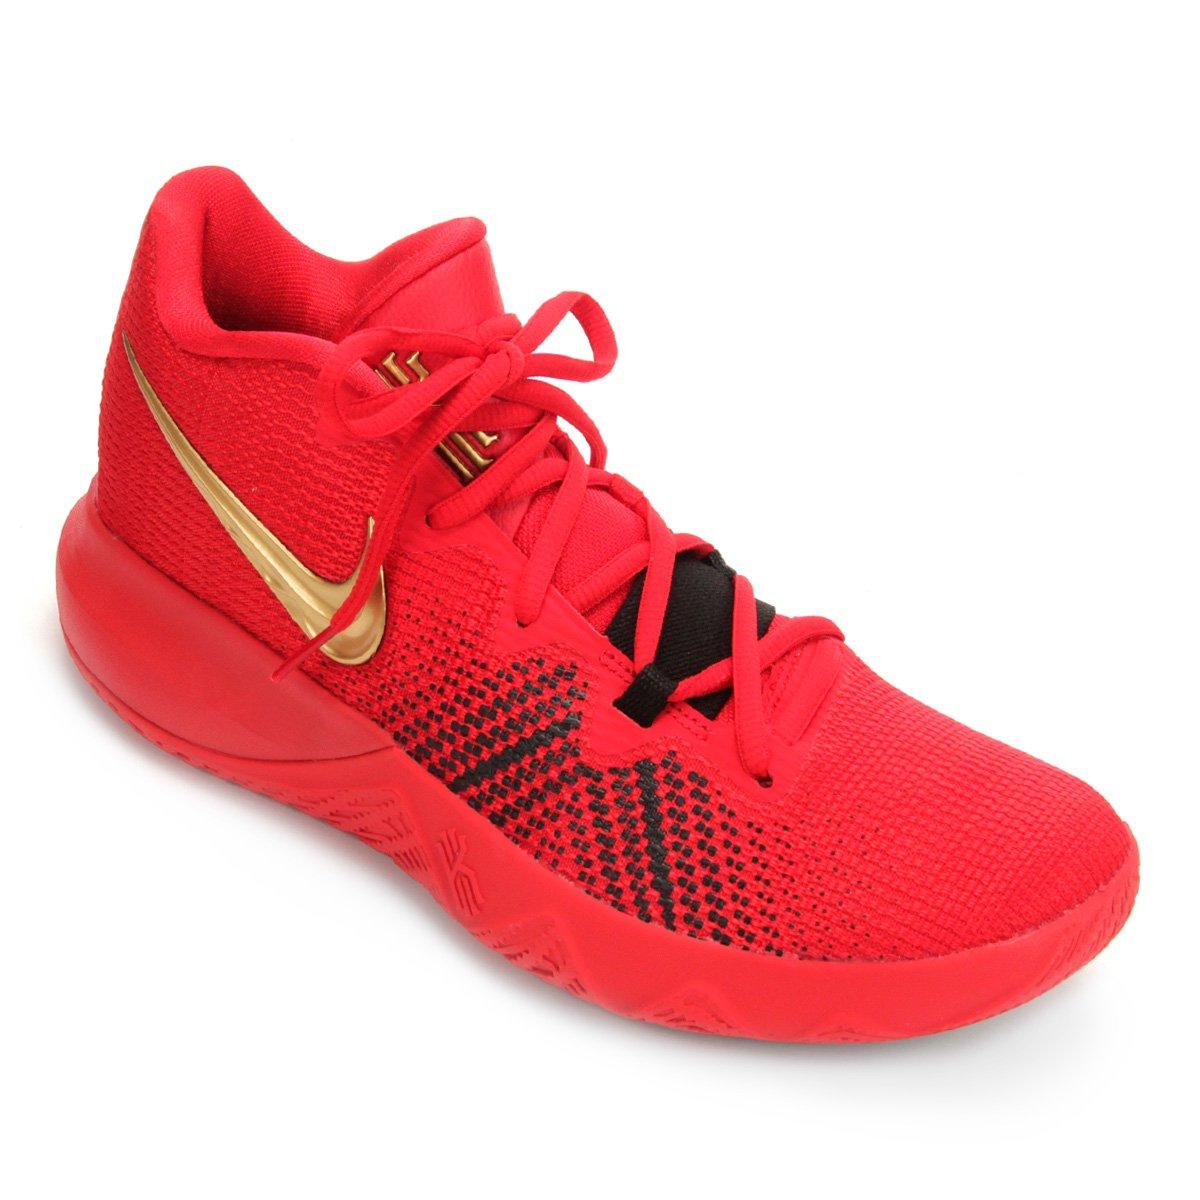 e6e06c45627 Tênis Nike Kyrie Flytrap Masculino - Compre Agora